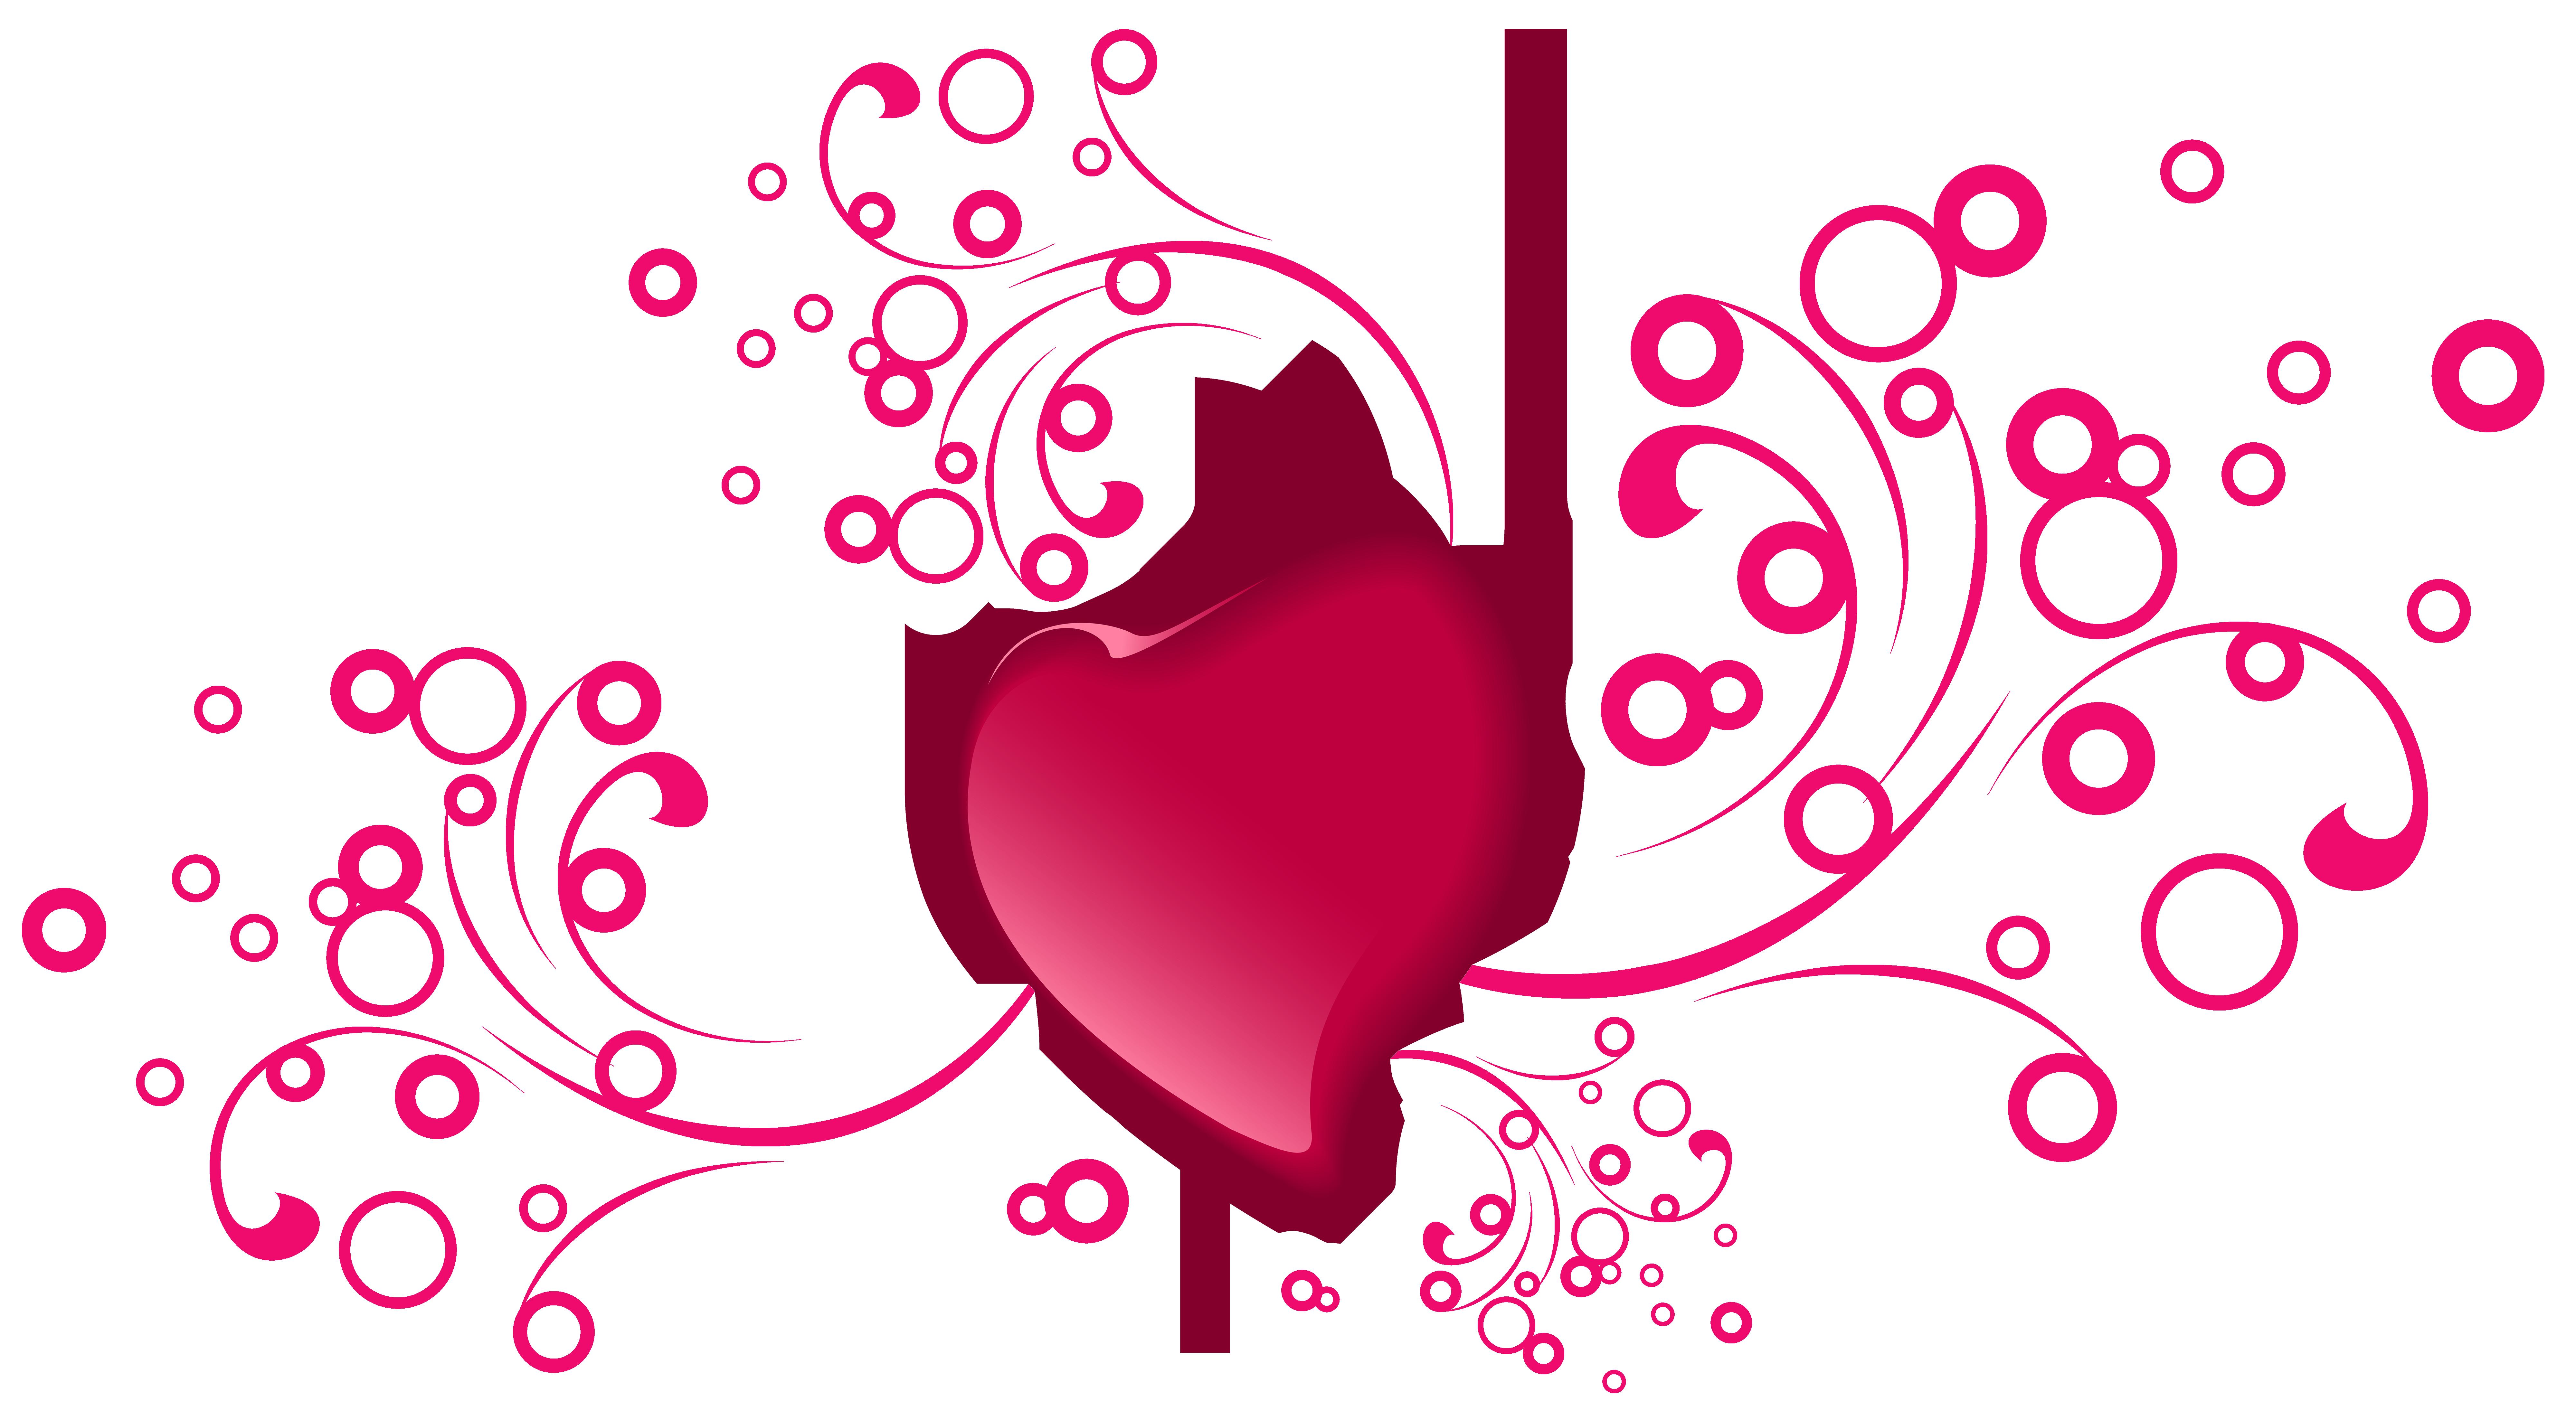 Valentine's Day Decorative Heart Transparent PNG Clip Art Image.